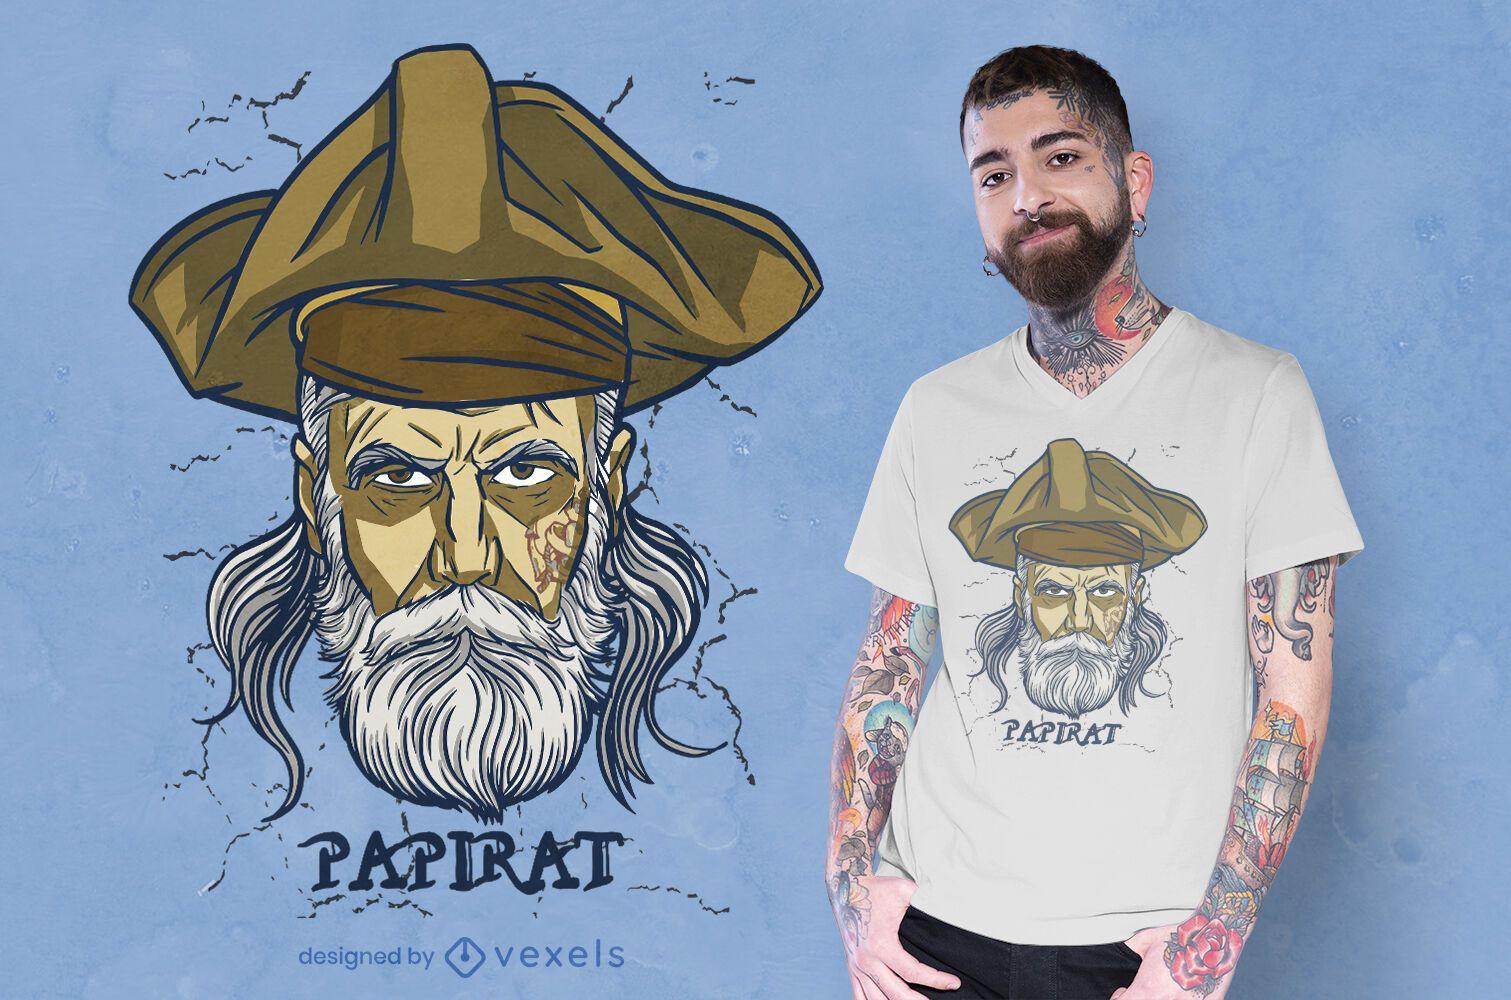 Pirate dad german wordplay t-shirt design